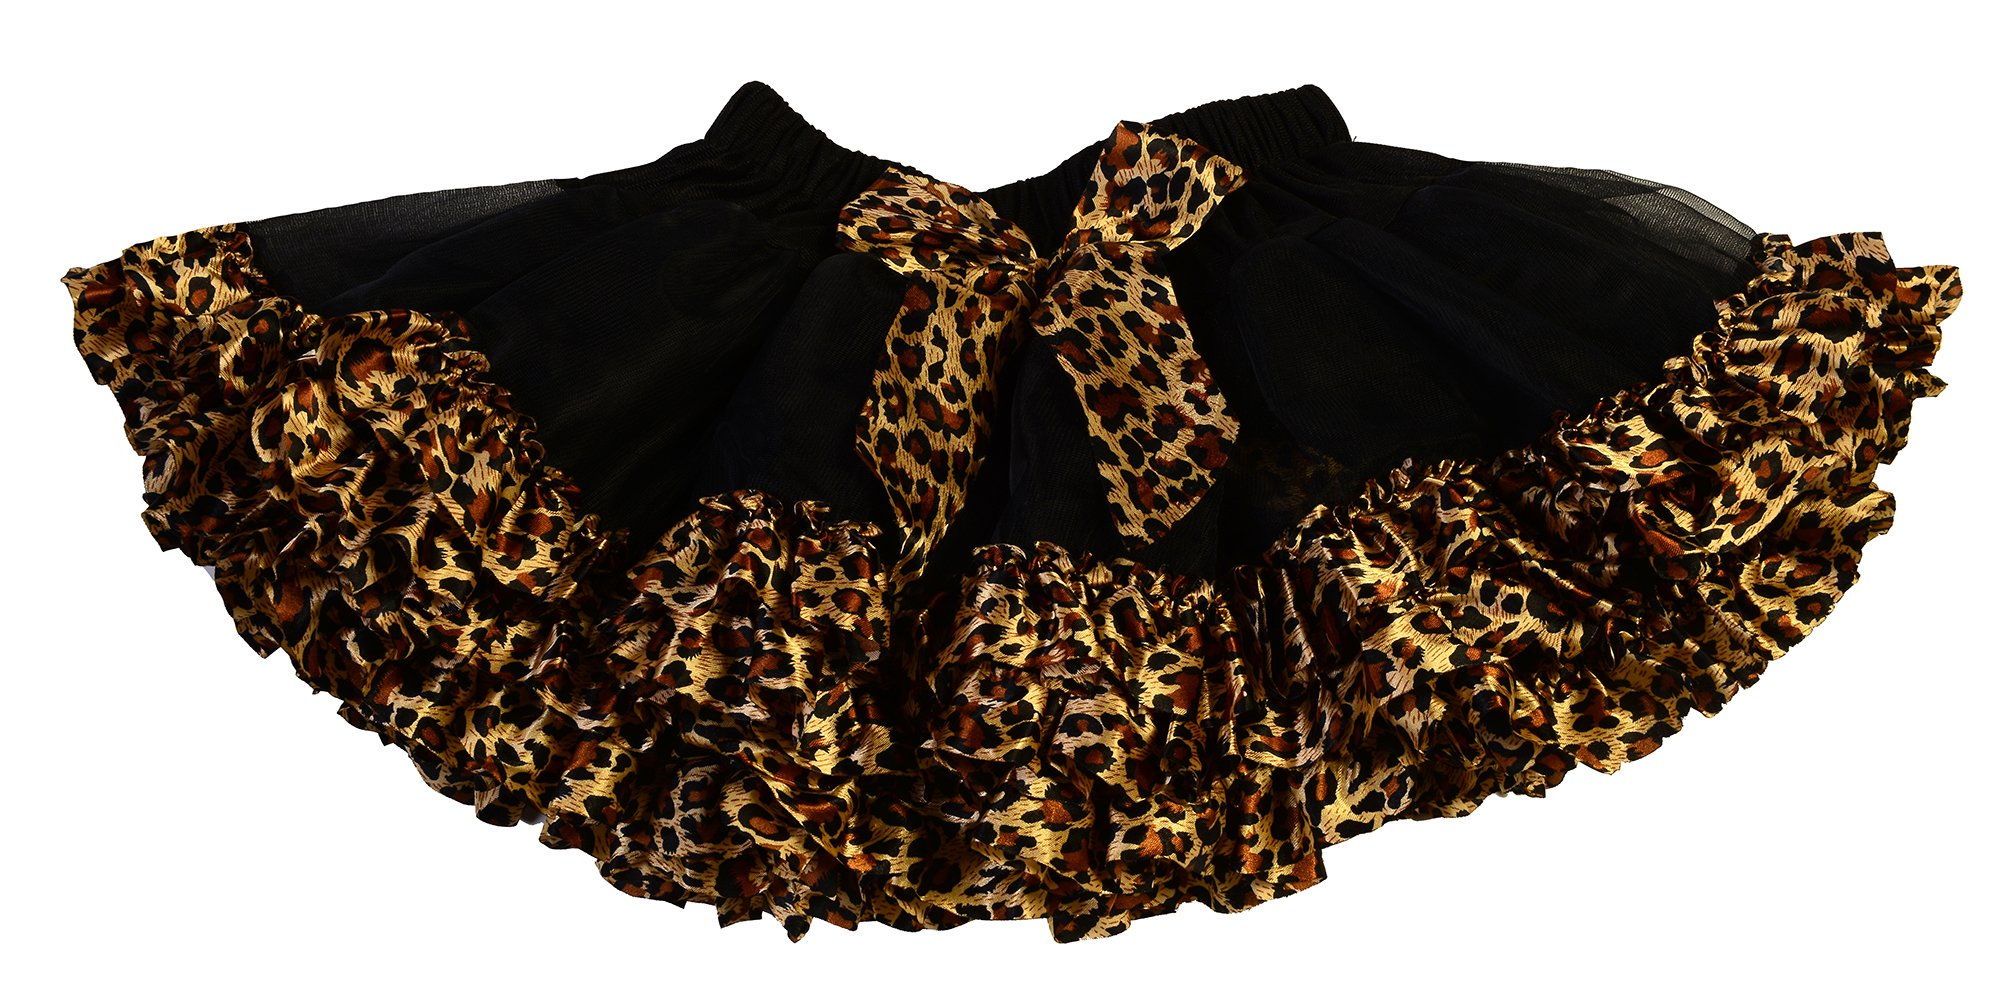 Max Daniel Designs Maxine Girls' Fluffy Tulle Tutu Skirt Tiered Animal Print Ballet Dance Pettiskirt Dress (Extra Large, Black/Leopard)